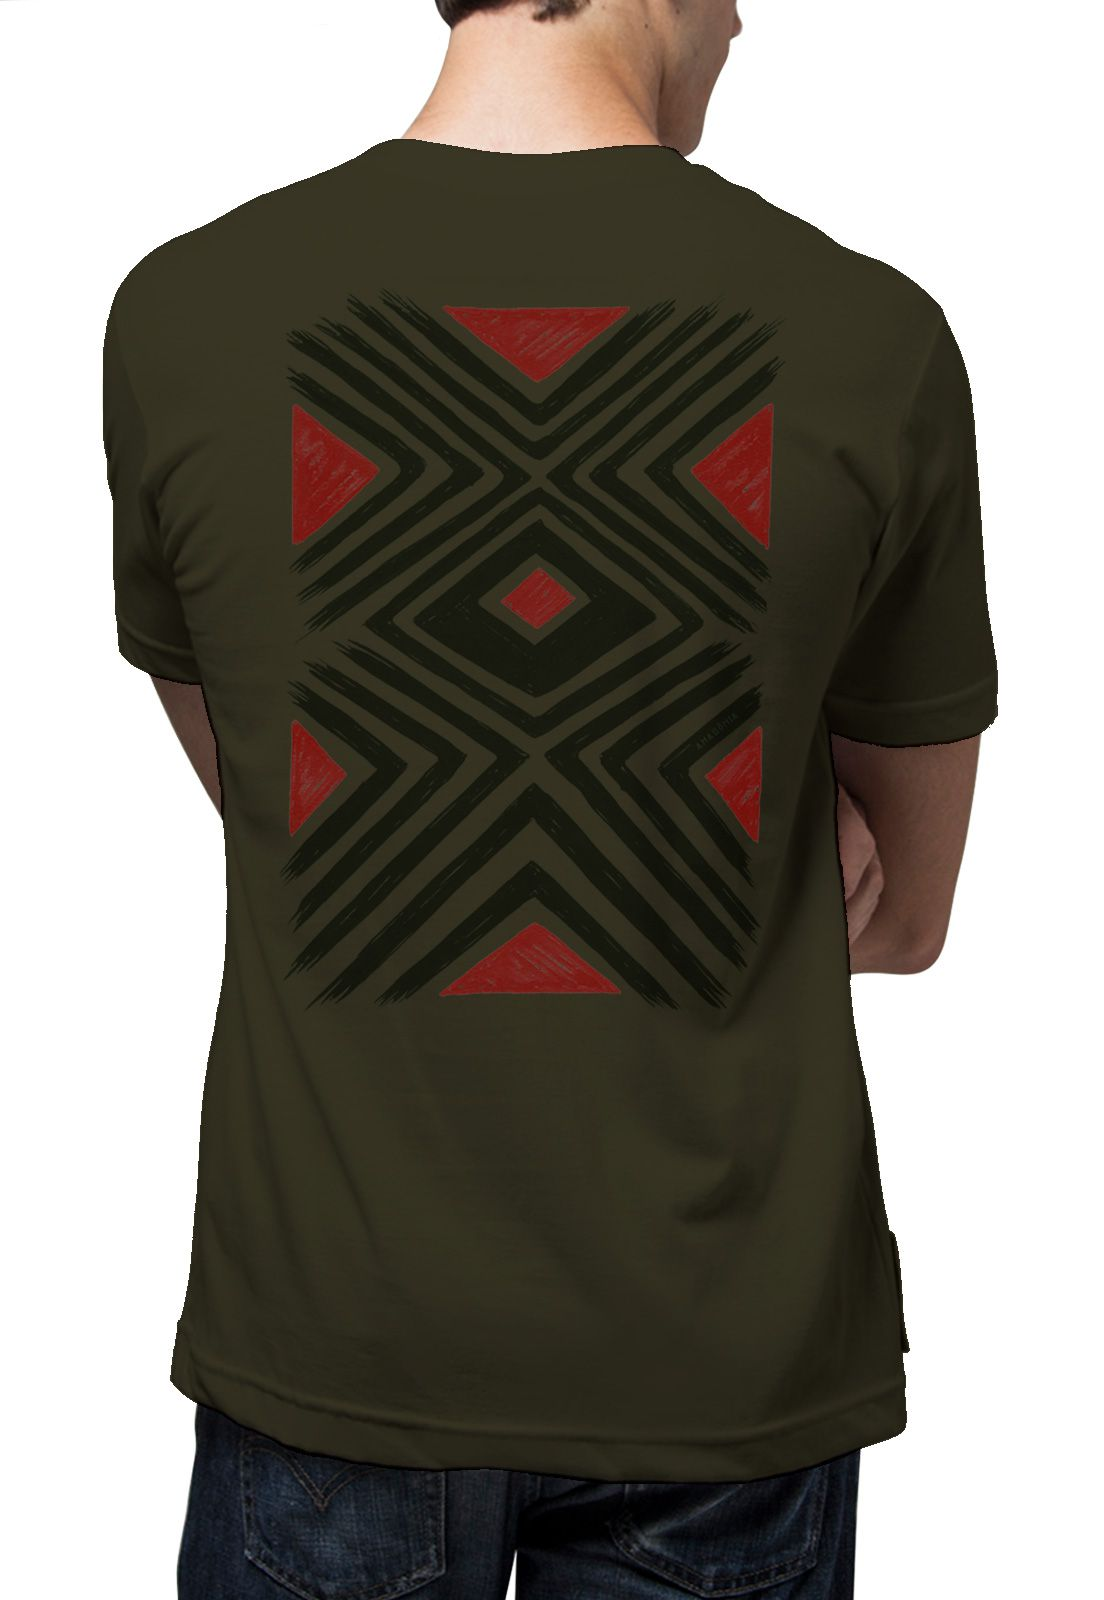 Camiseta Amazônia Grafismo - Verde Escuro